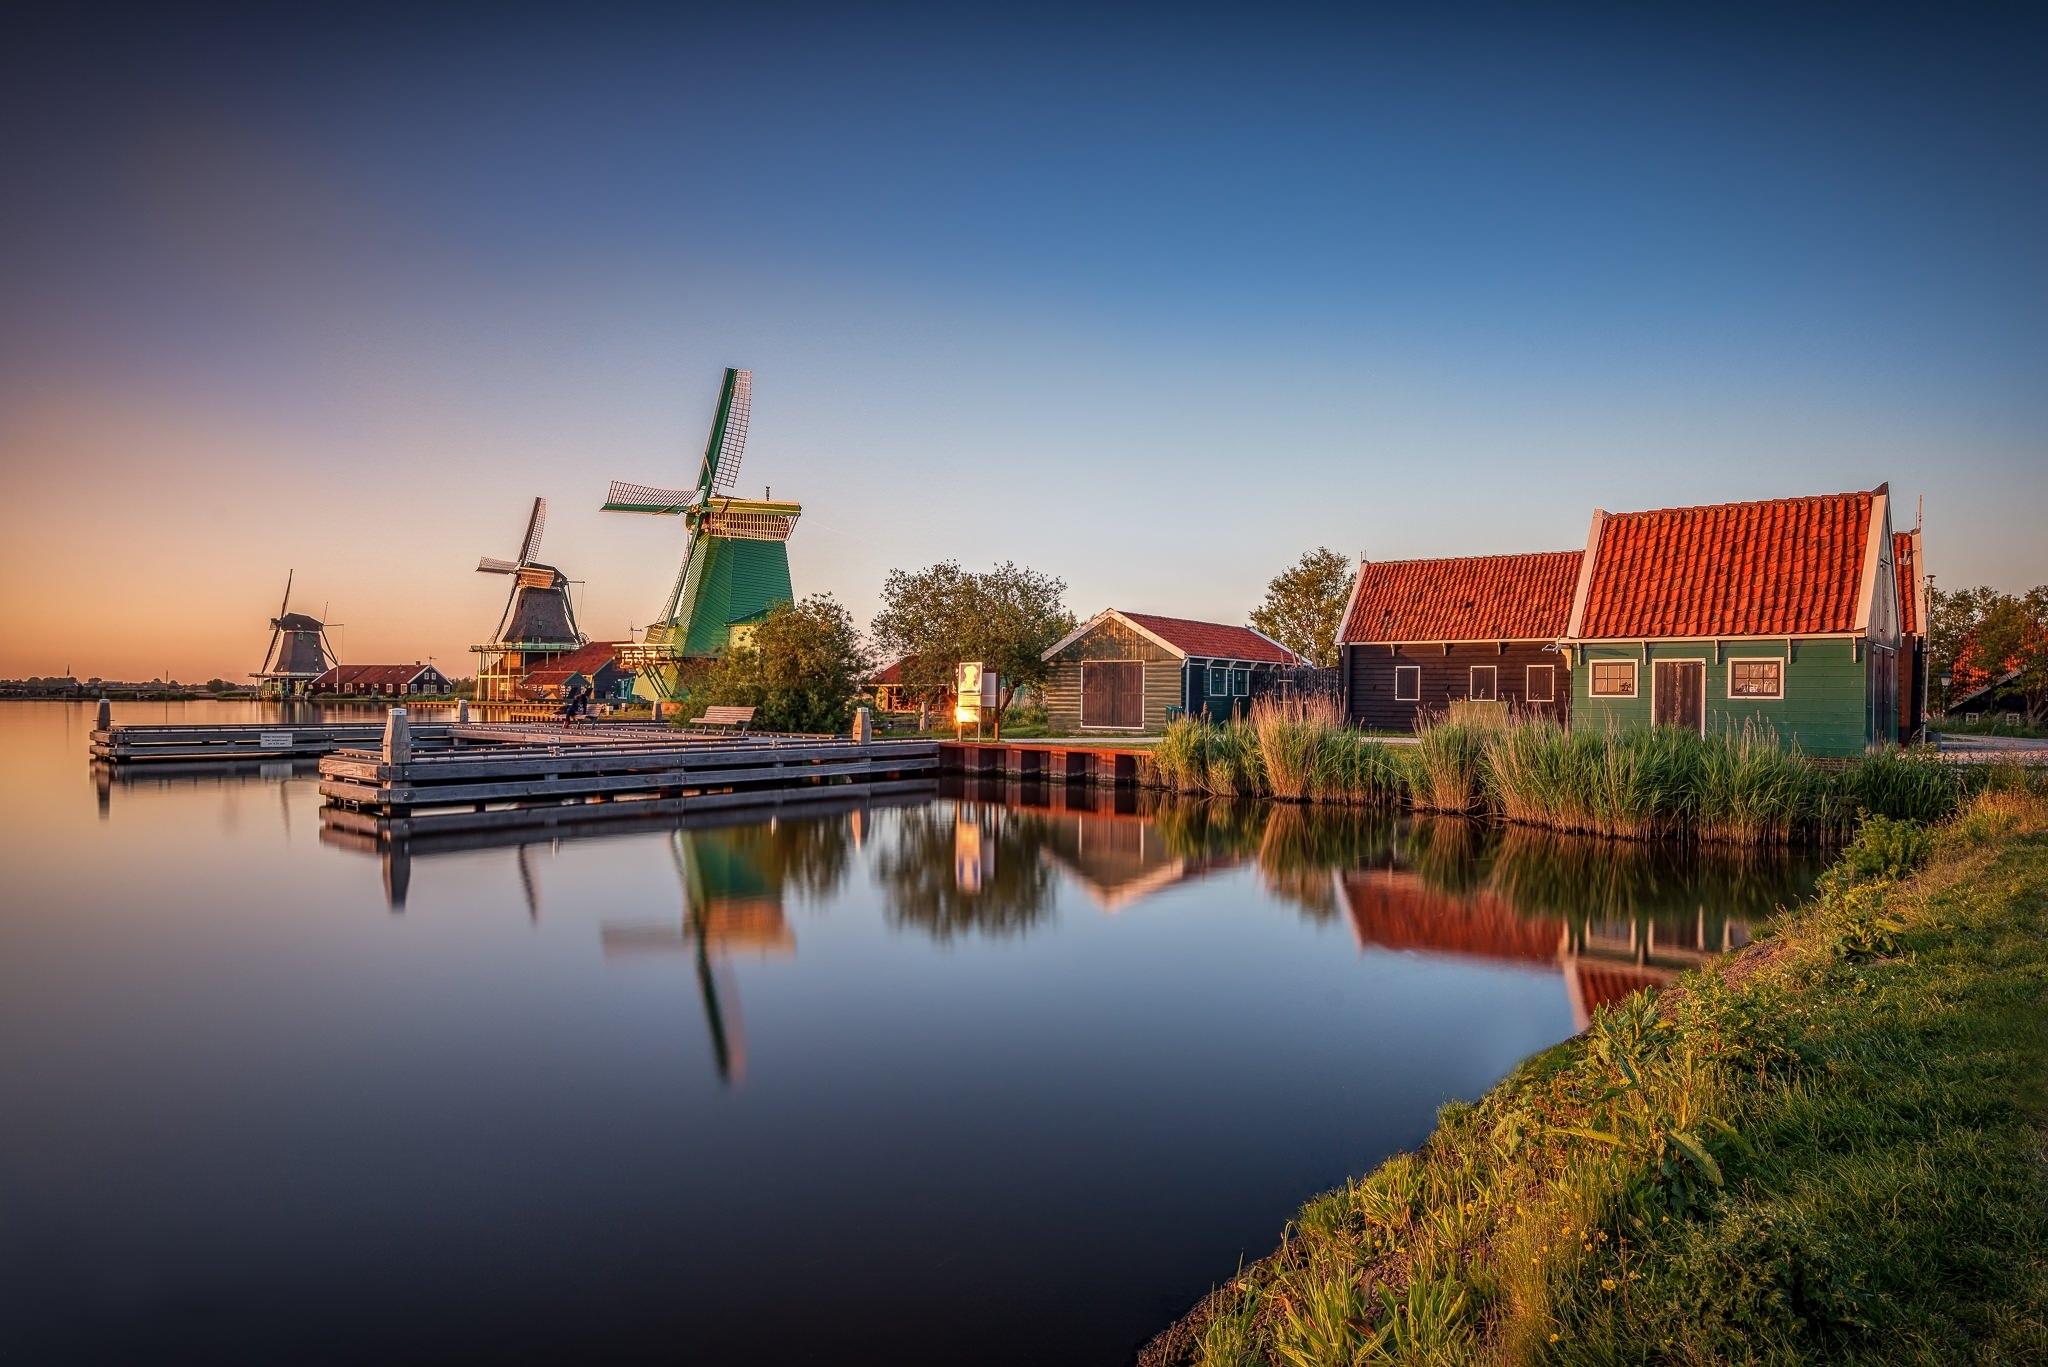 wonderful-pics-of-windmills-surrounded-by-tulips-fields-secret-world